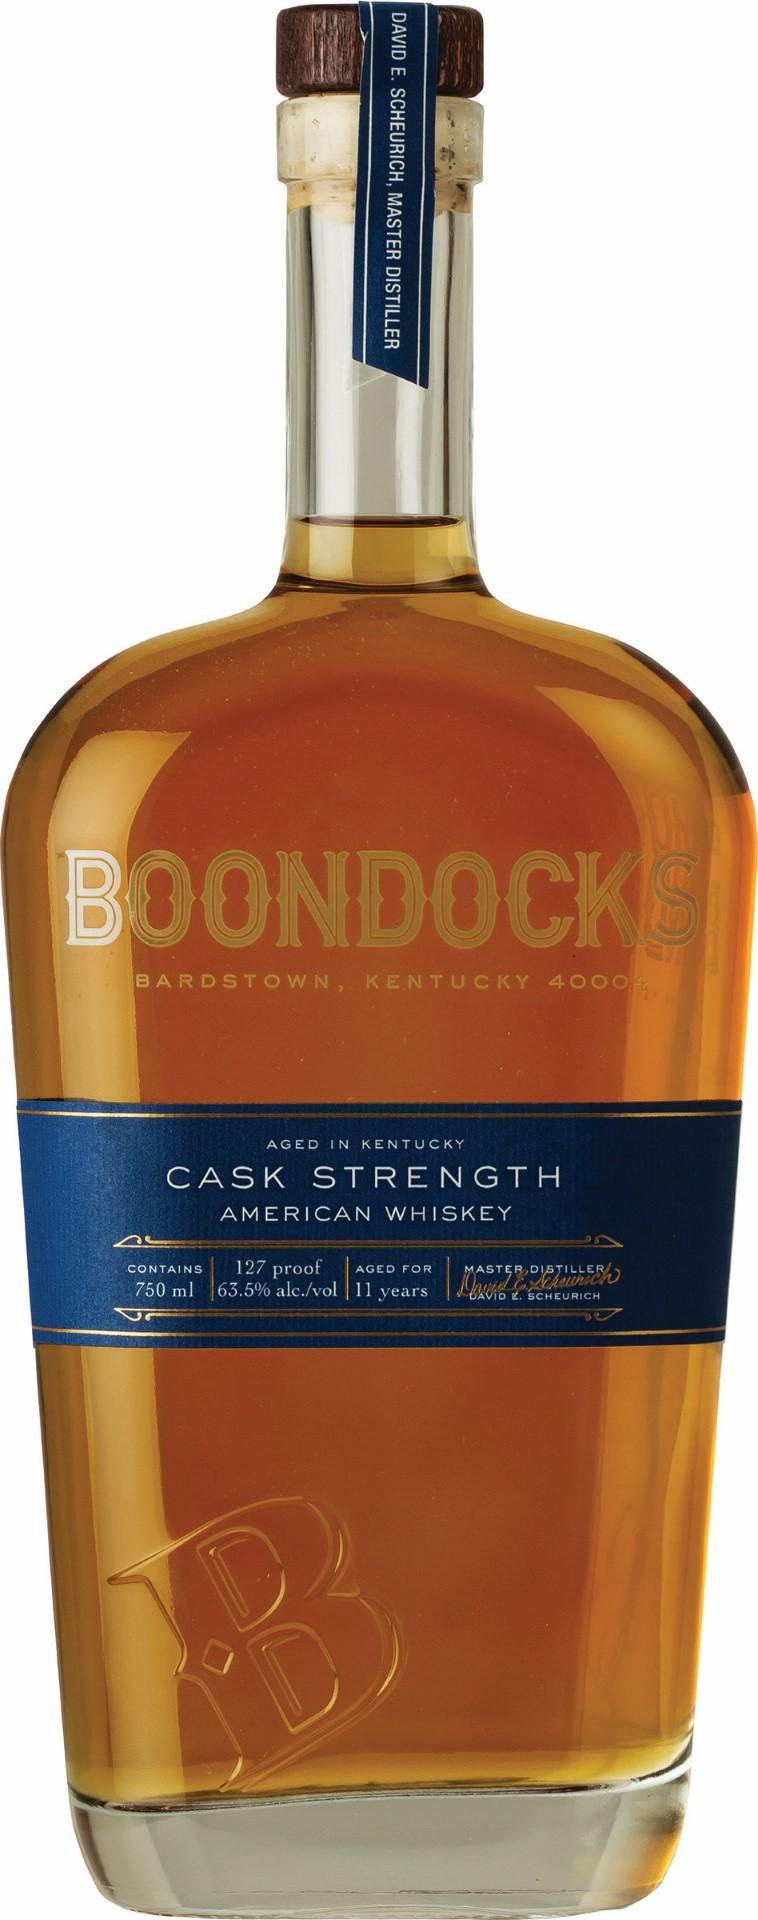 Boondocks Cask Strength American Whiskey